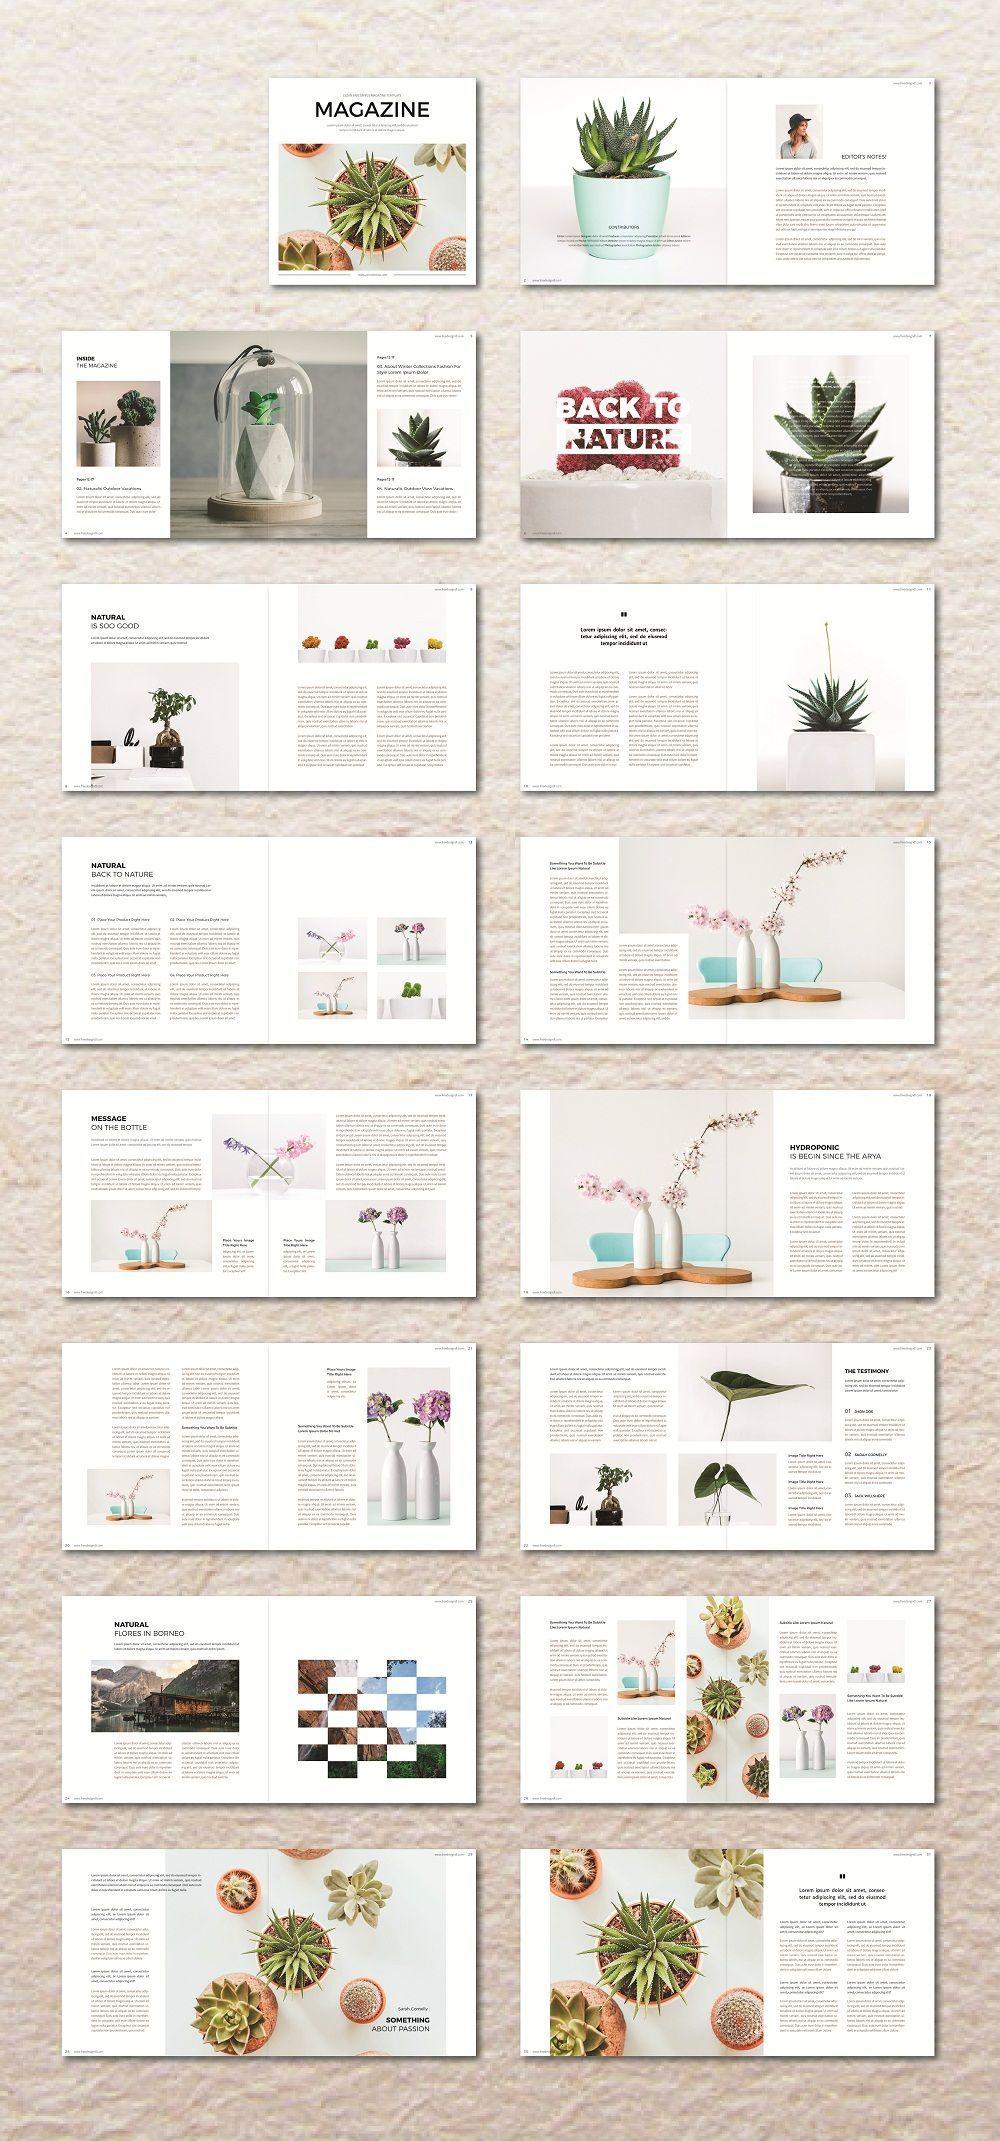 graphic solutions ma king art pinterest. Black Bedroom Furniture Sets. Home Design Ideas